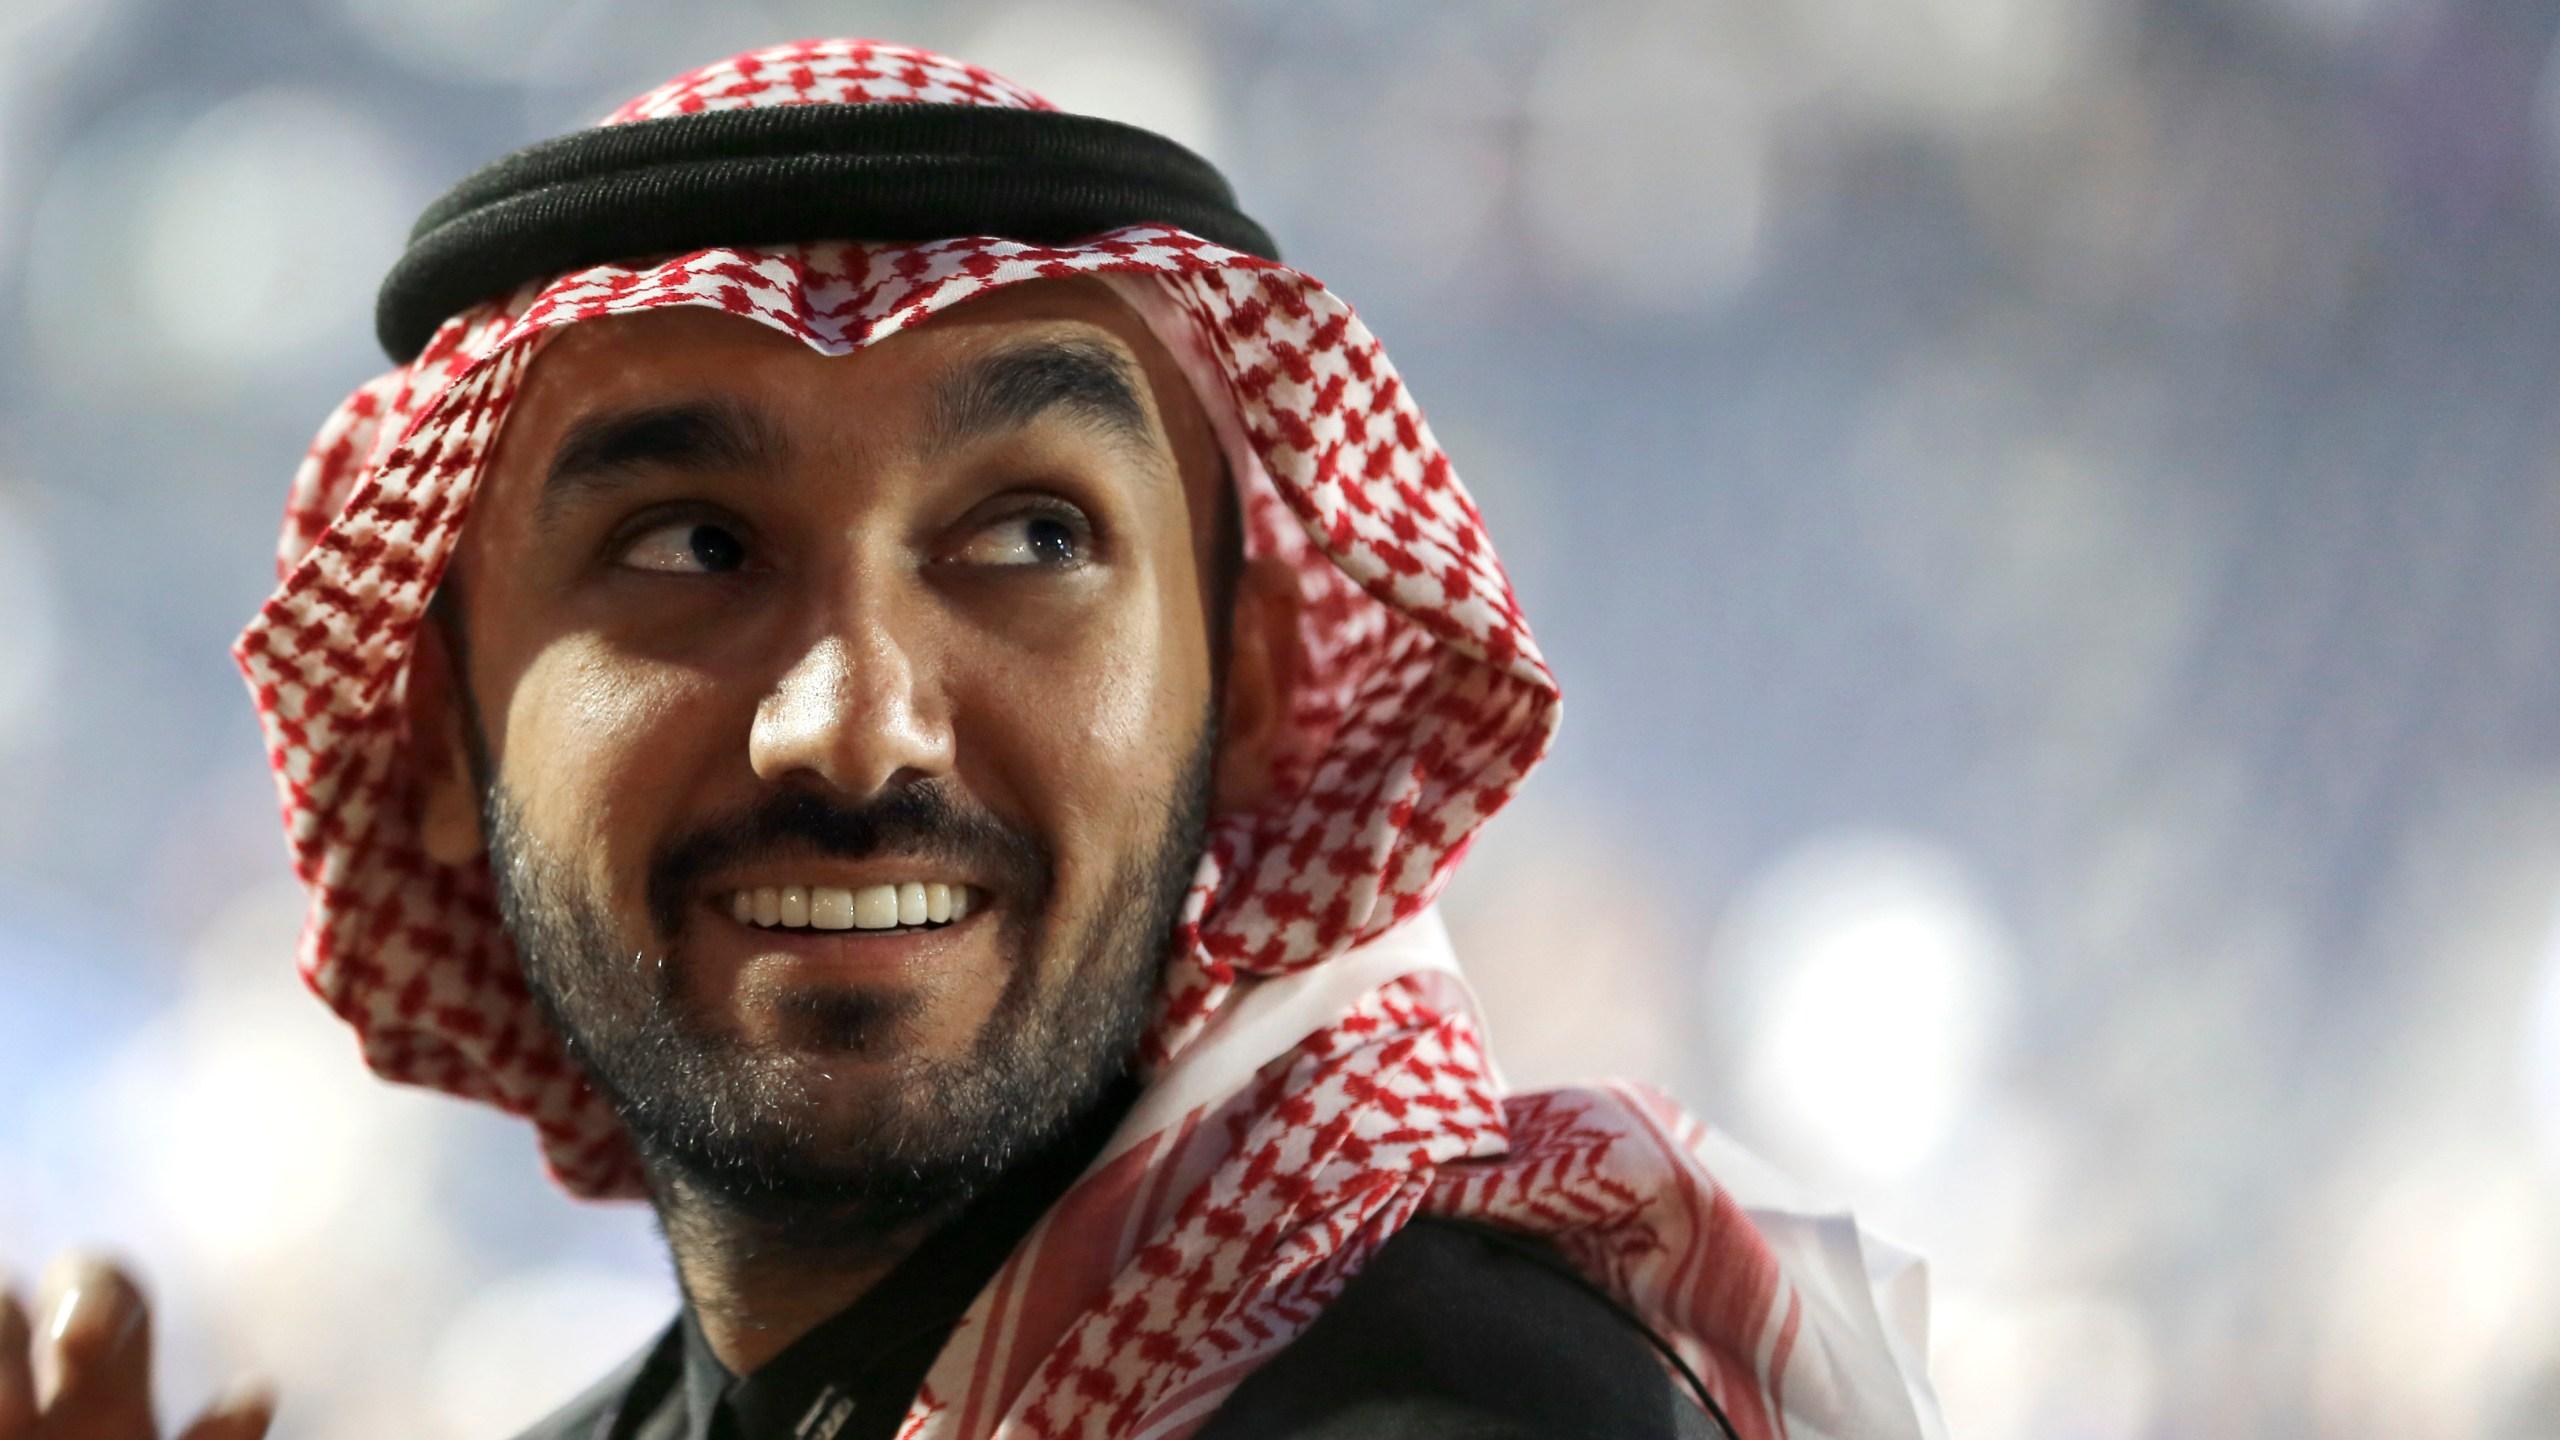 Abdulaziz bin Turki al-Faisal